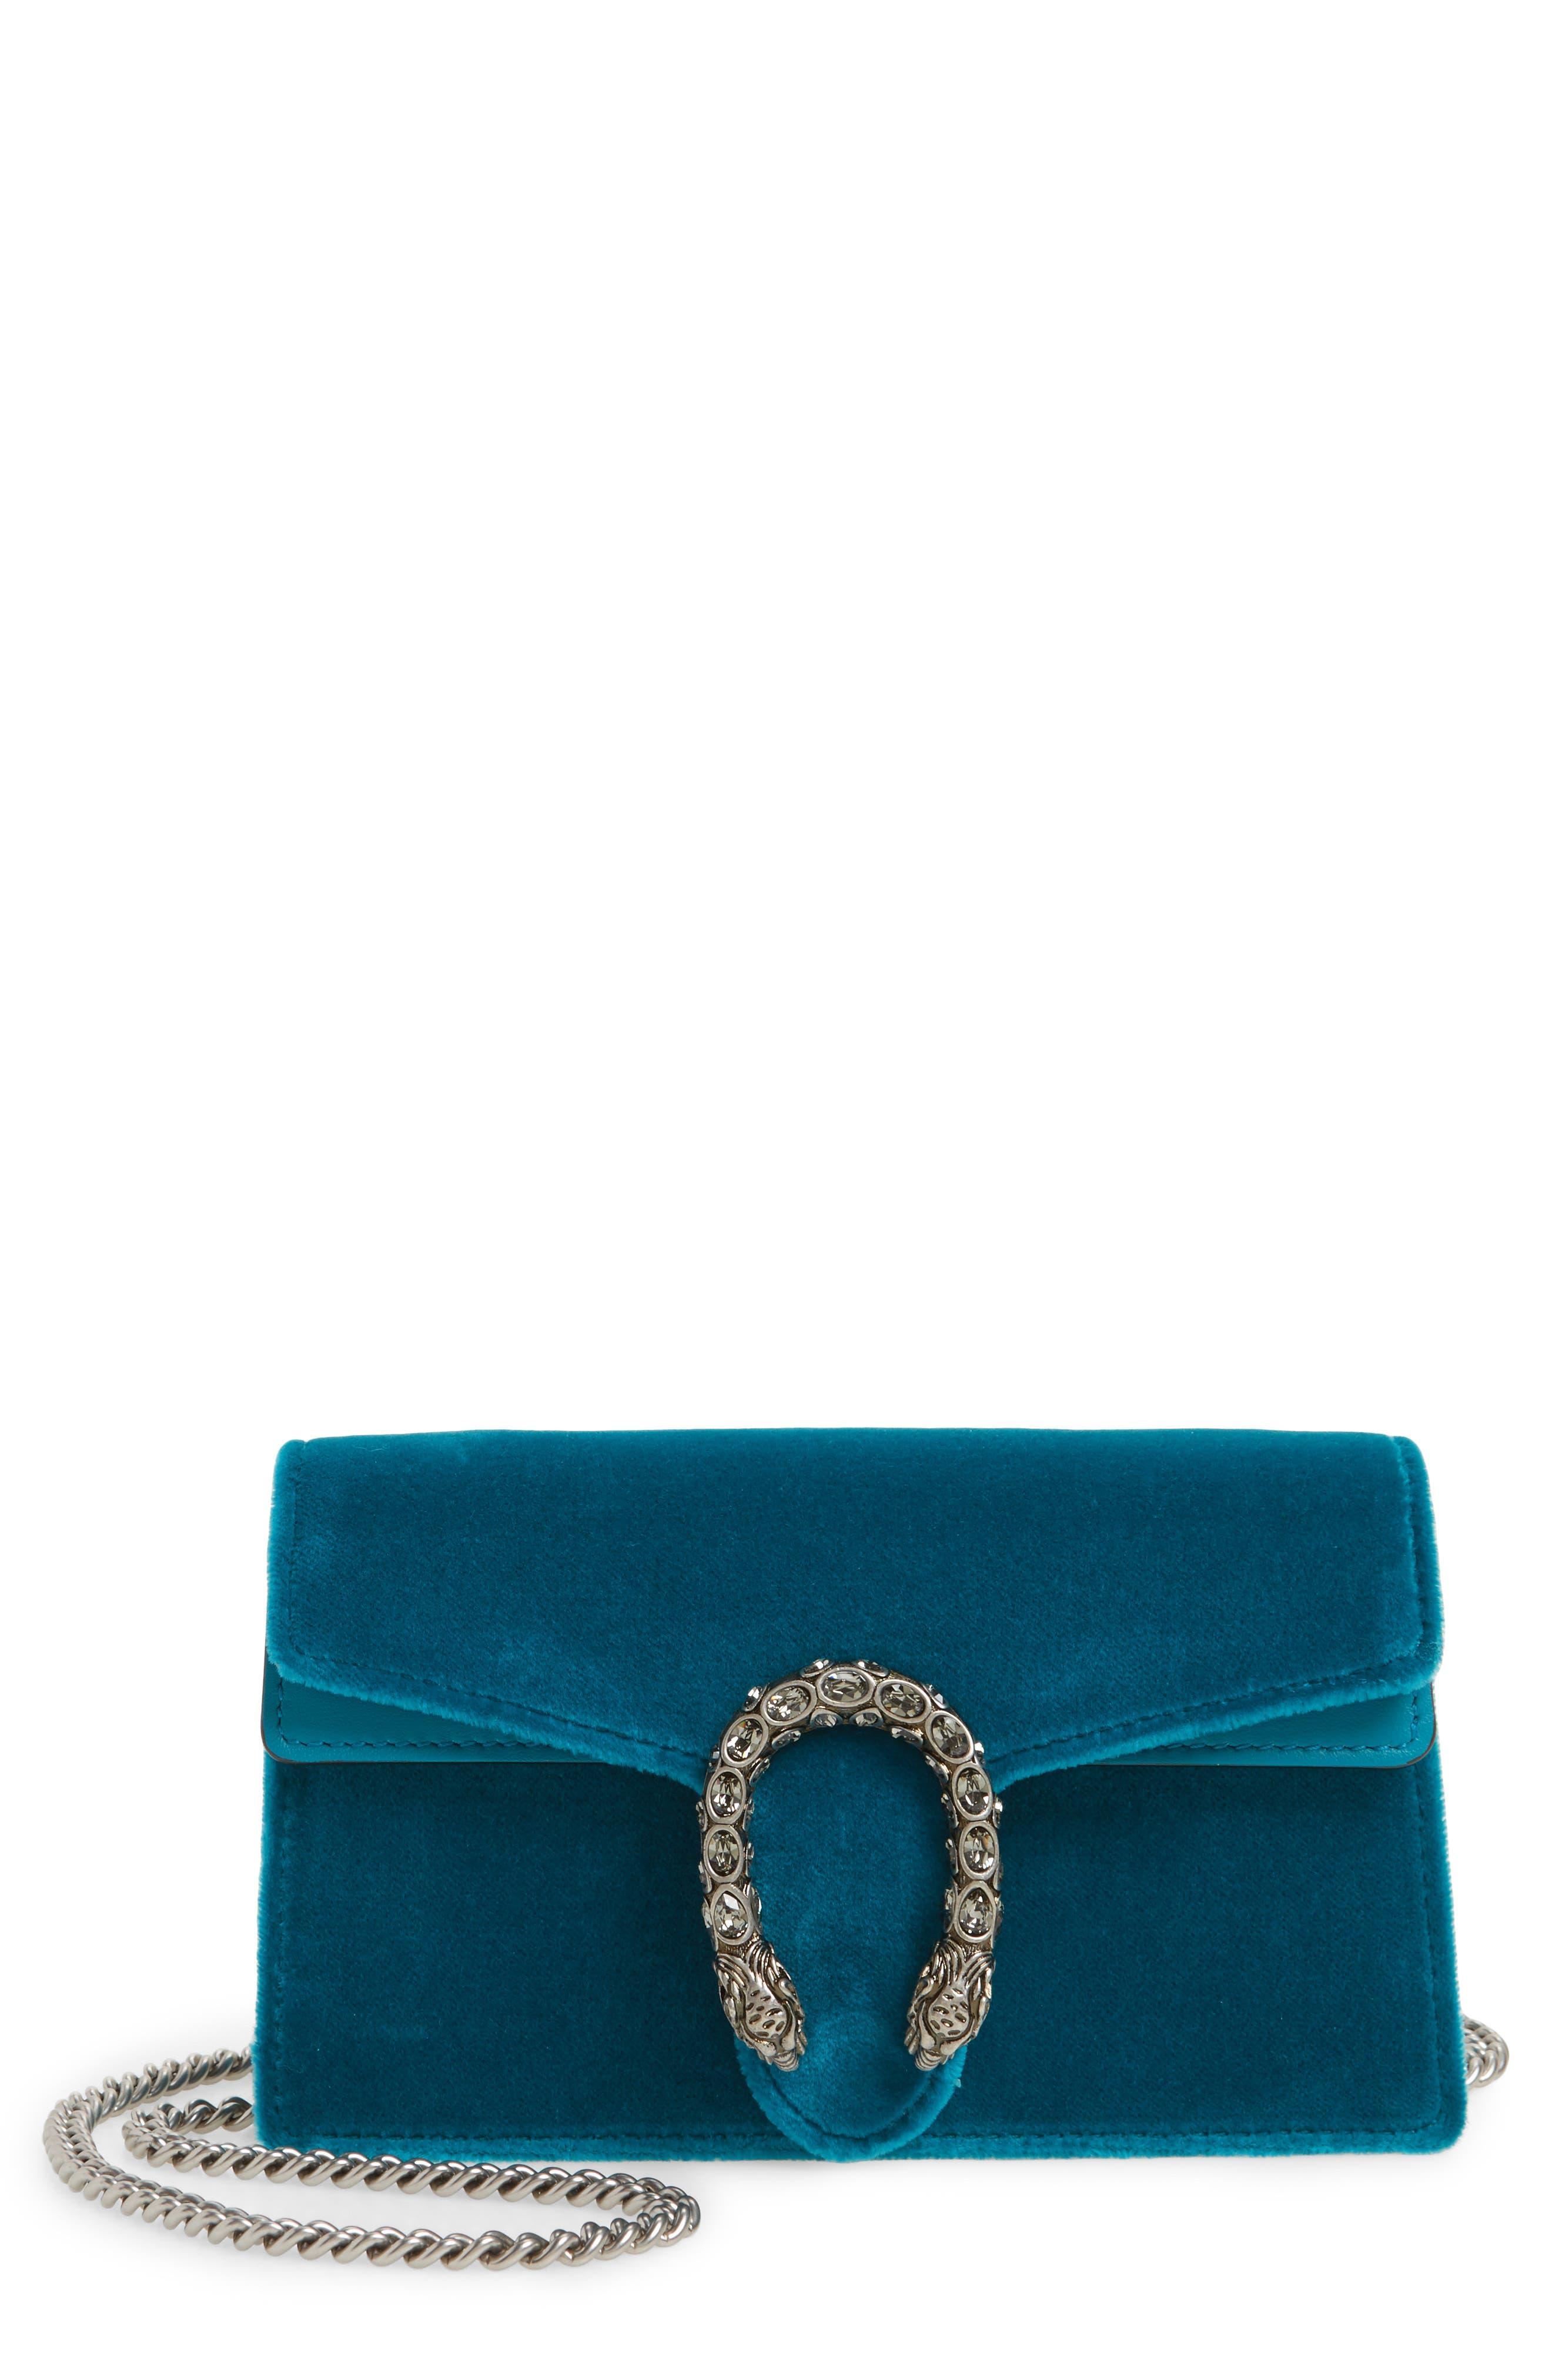 Super Mini Dionysus Velvet Shoulder Bag,                         Main,                         color, PIVONE